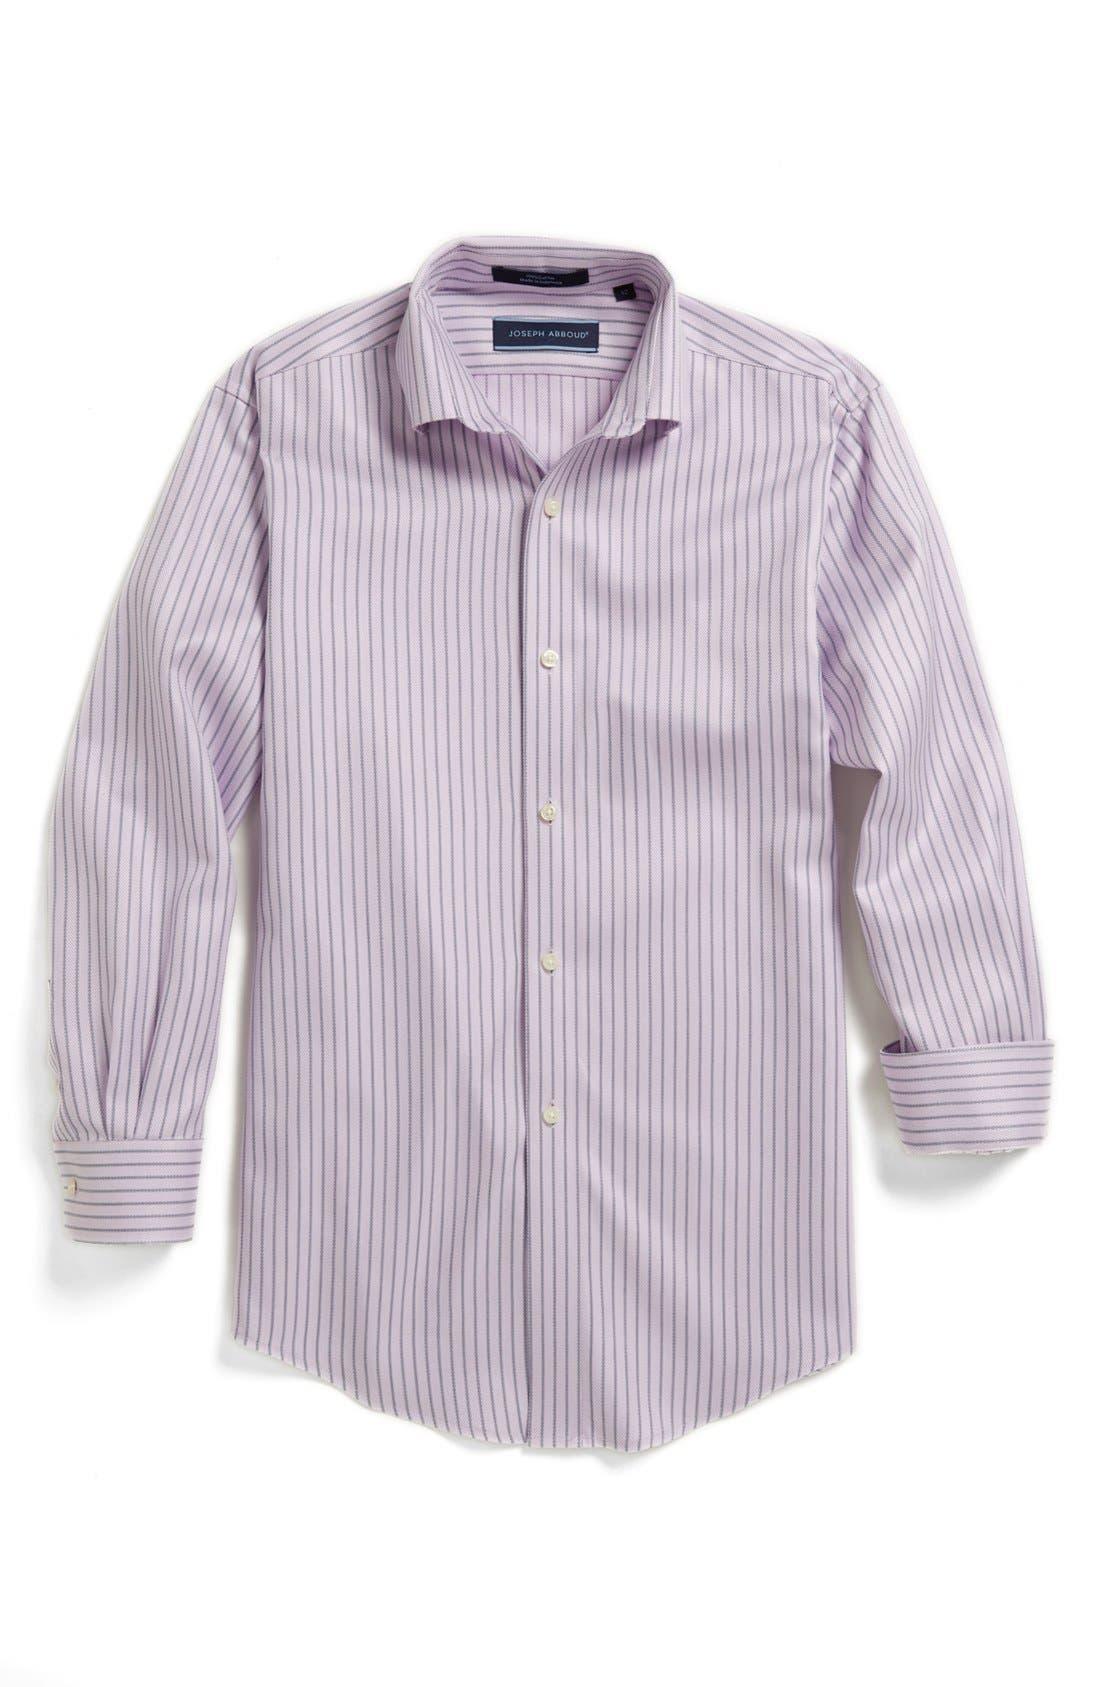 Main Image - Joseph Abboud Stripe Dress Shirt (Big Boys)